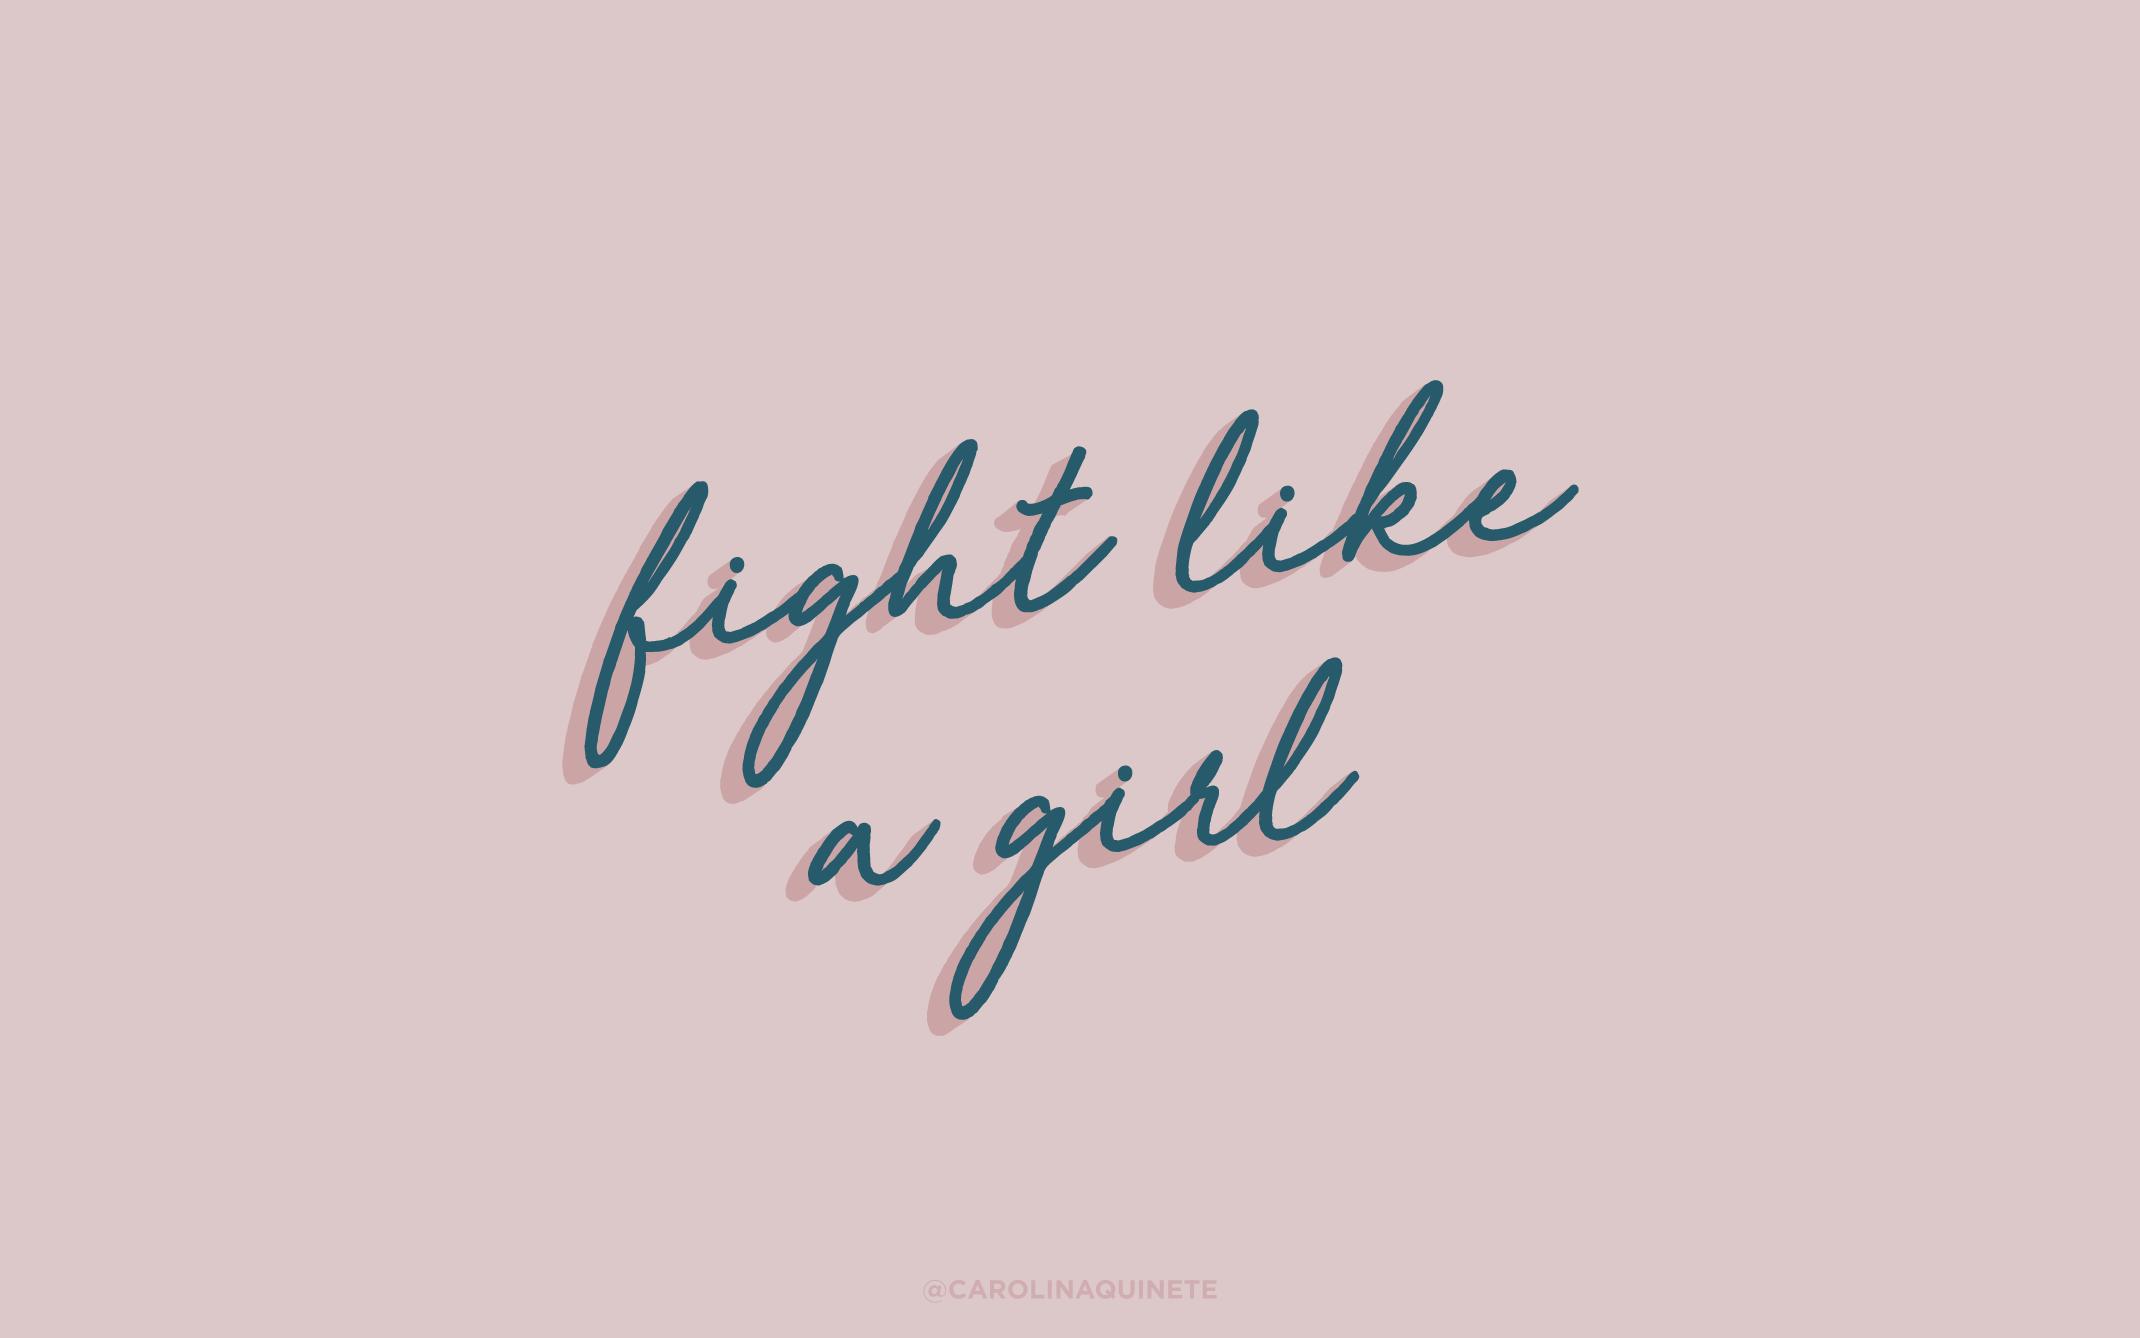 wallpaper girl feminist   Imagens para wallpaper, Planos de fundo feminino, Planos de fundo